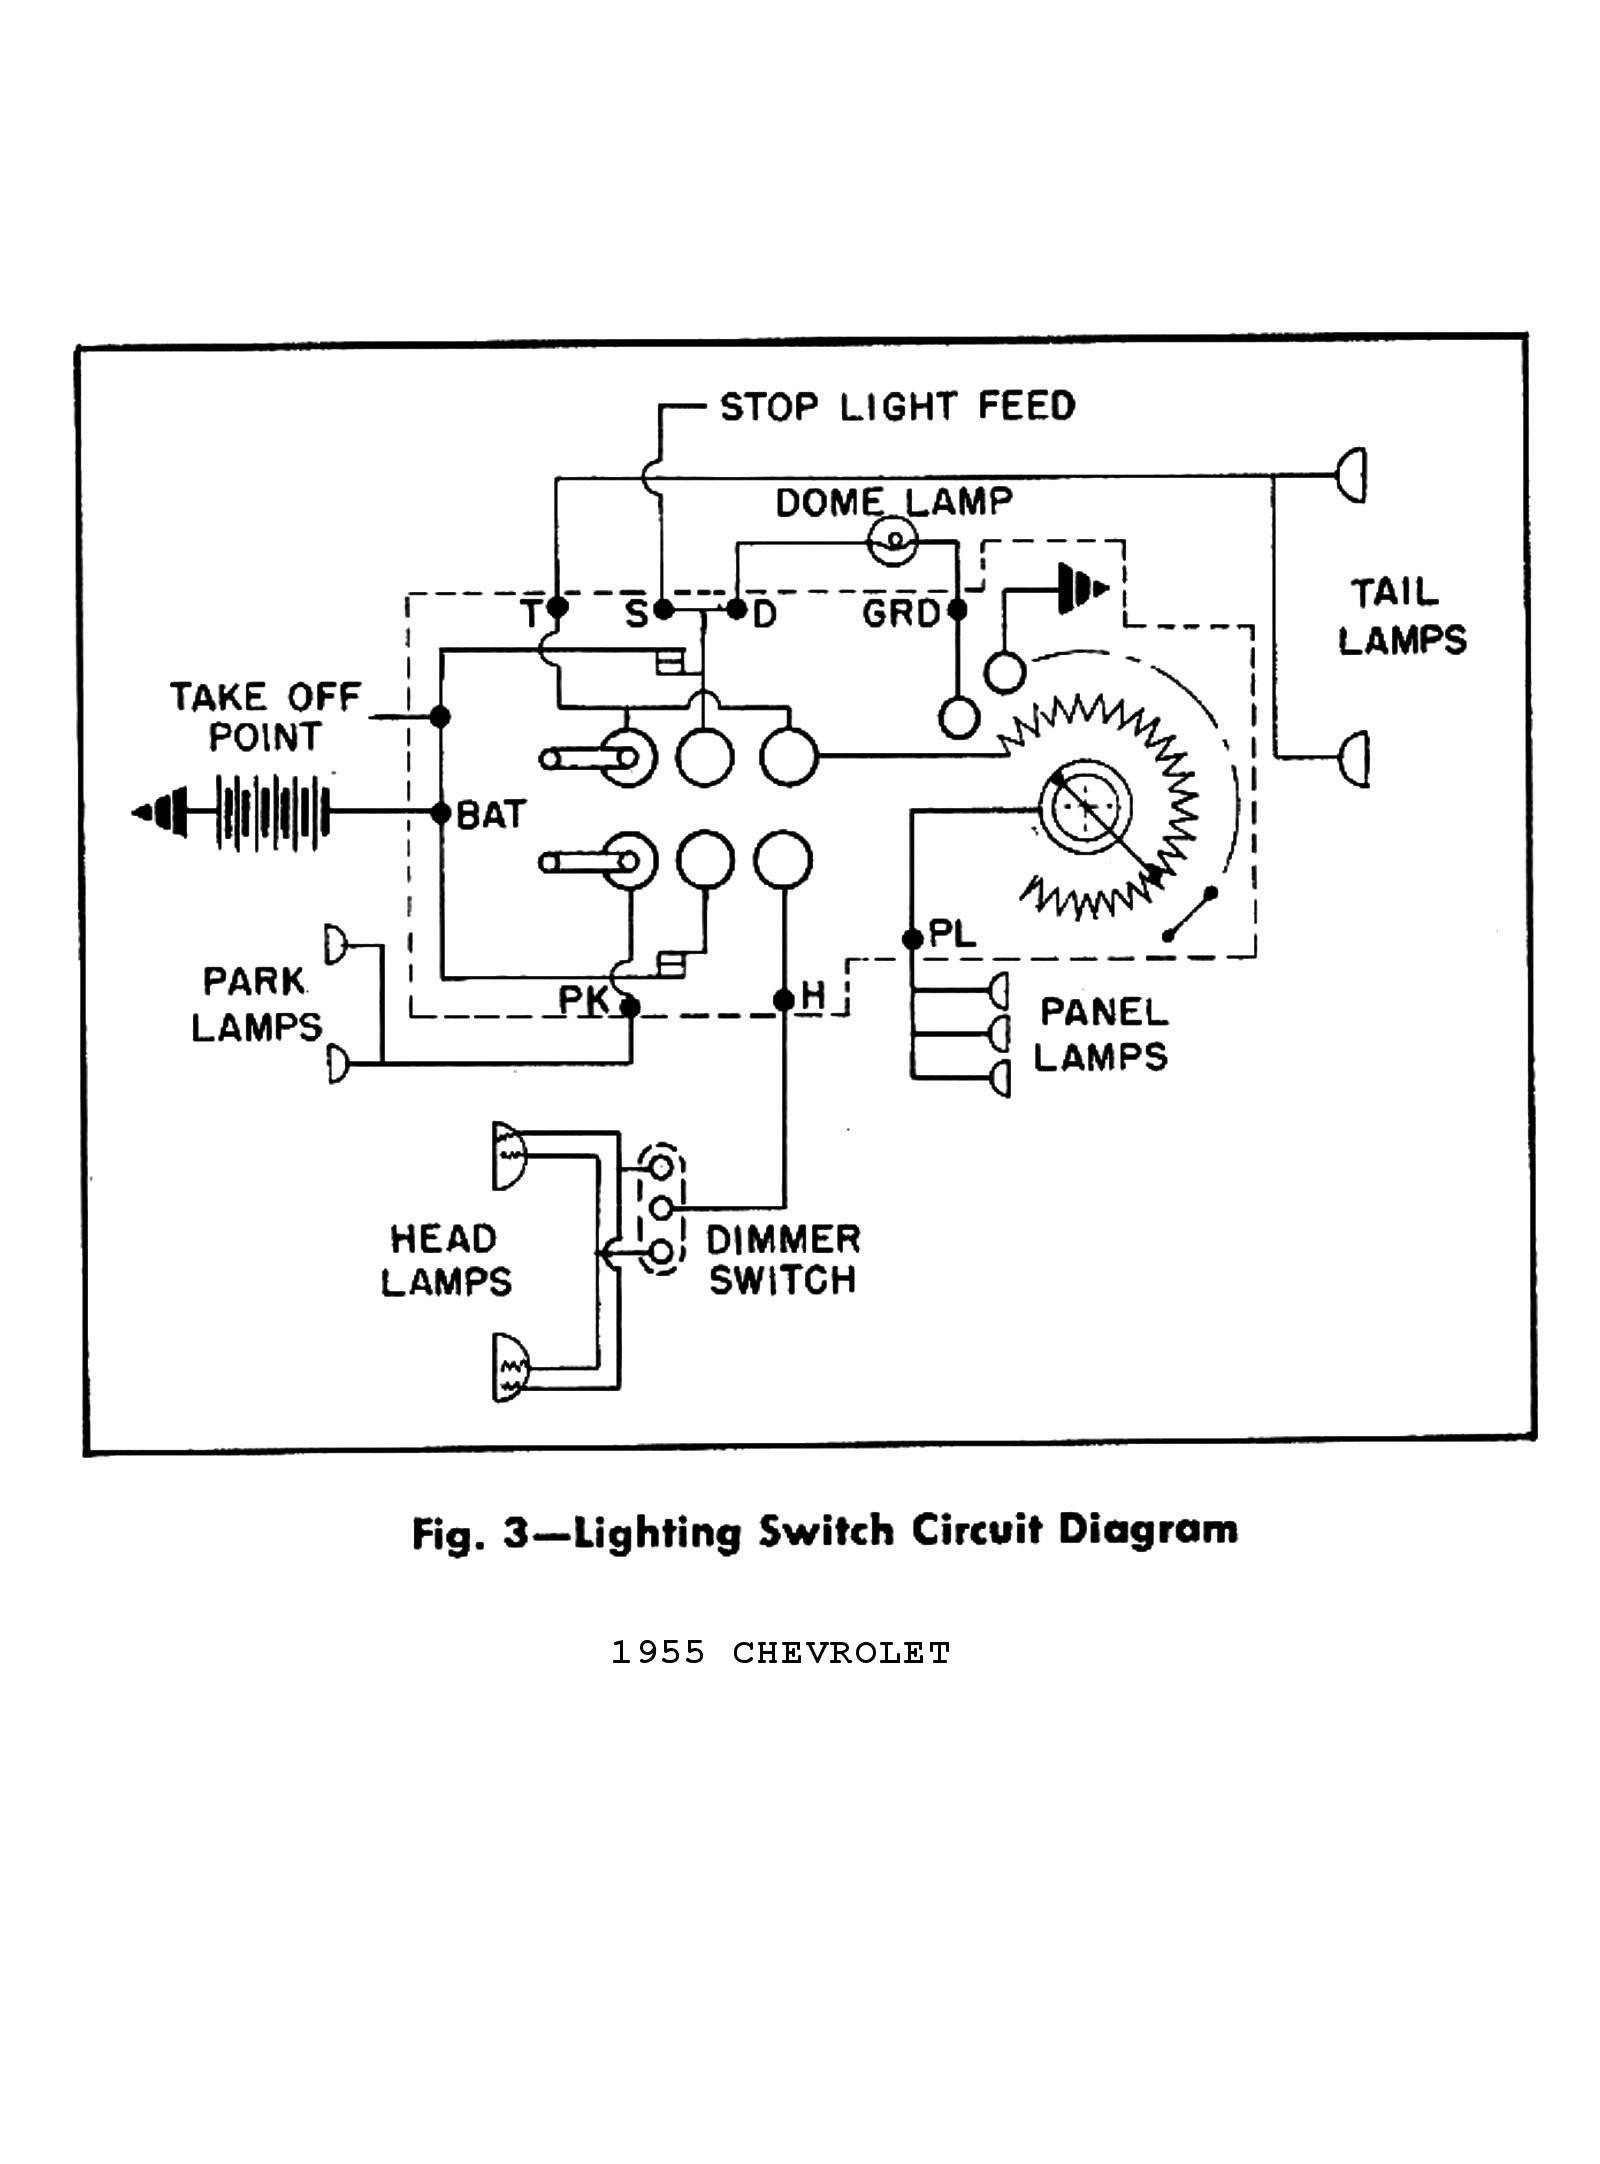 1955 Truck Wiring Diagrams · 1955 Electric Windows & Seats · 1955 Lighting Switch Circuit